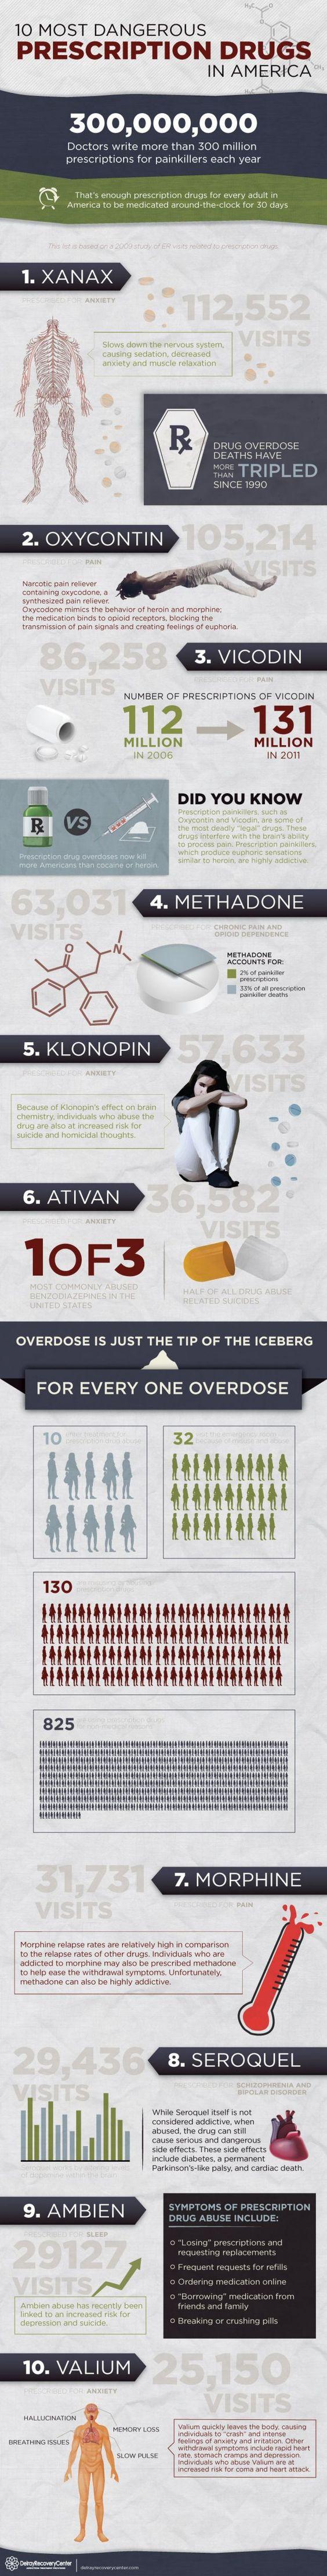 10 Most Dangerous Prescription Drugs Infographic - http://delrayrecoverycenter.com